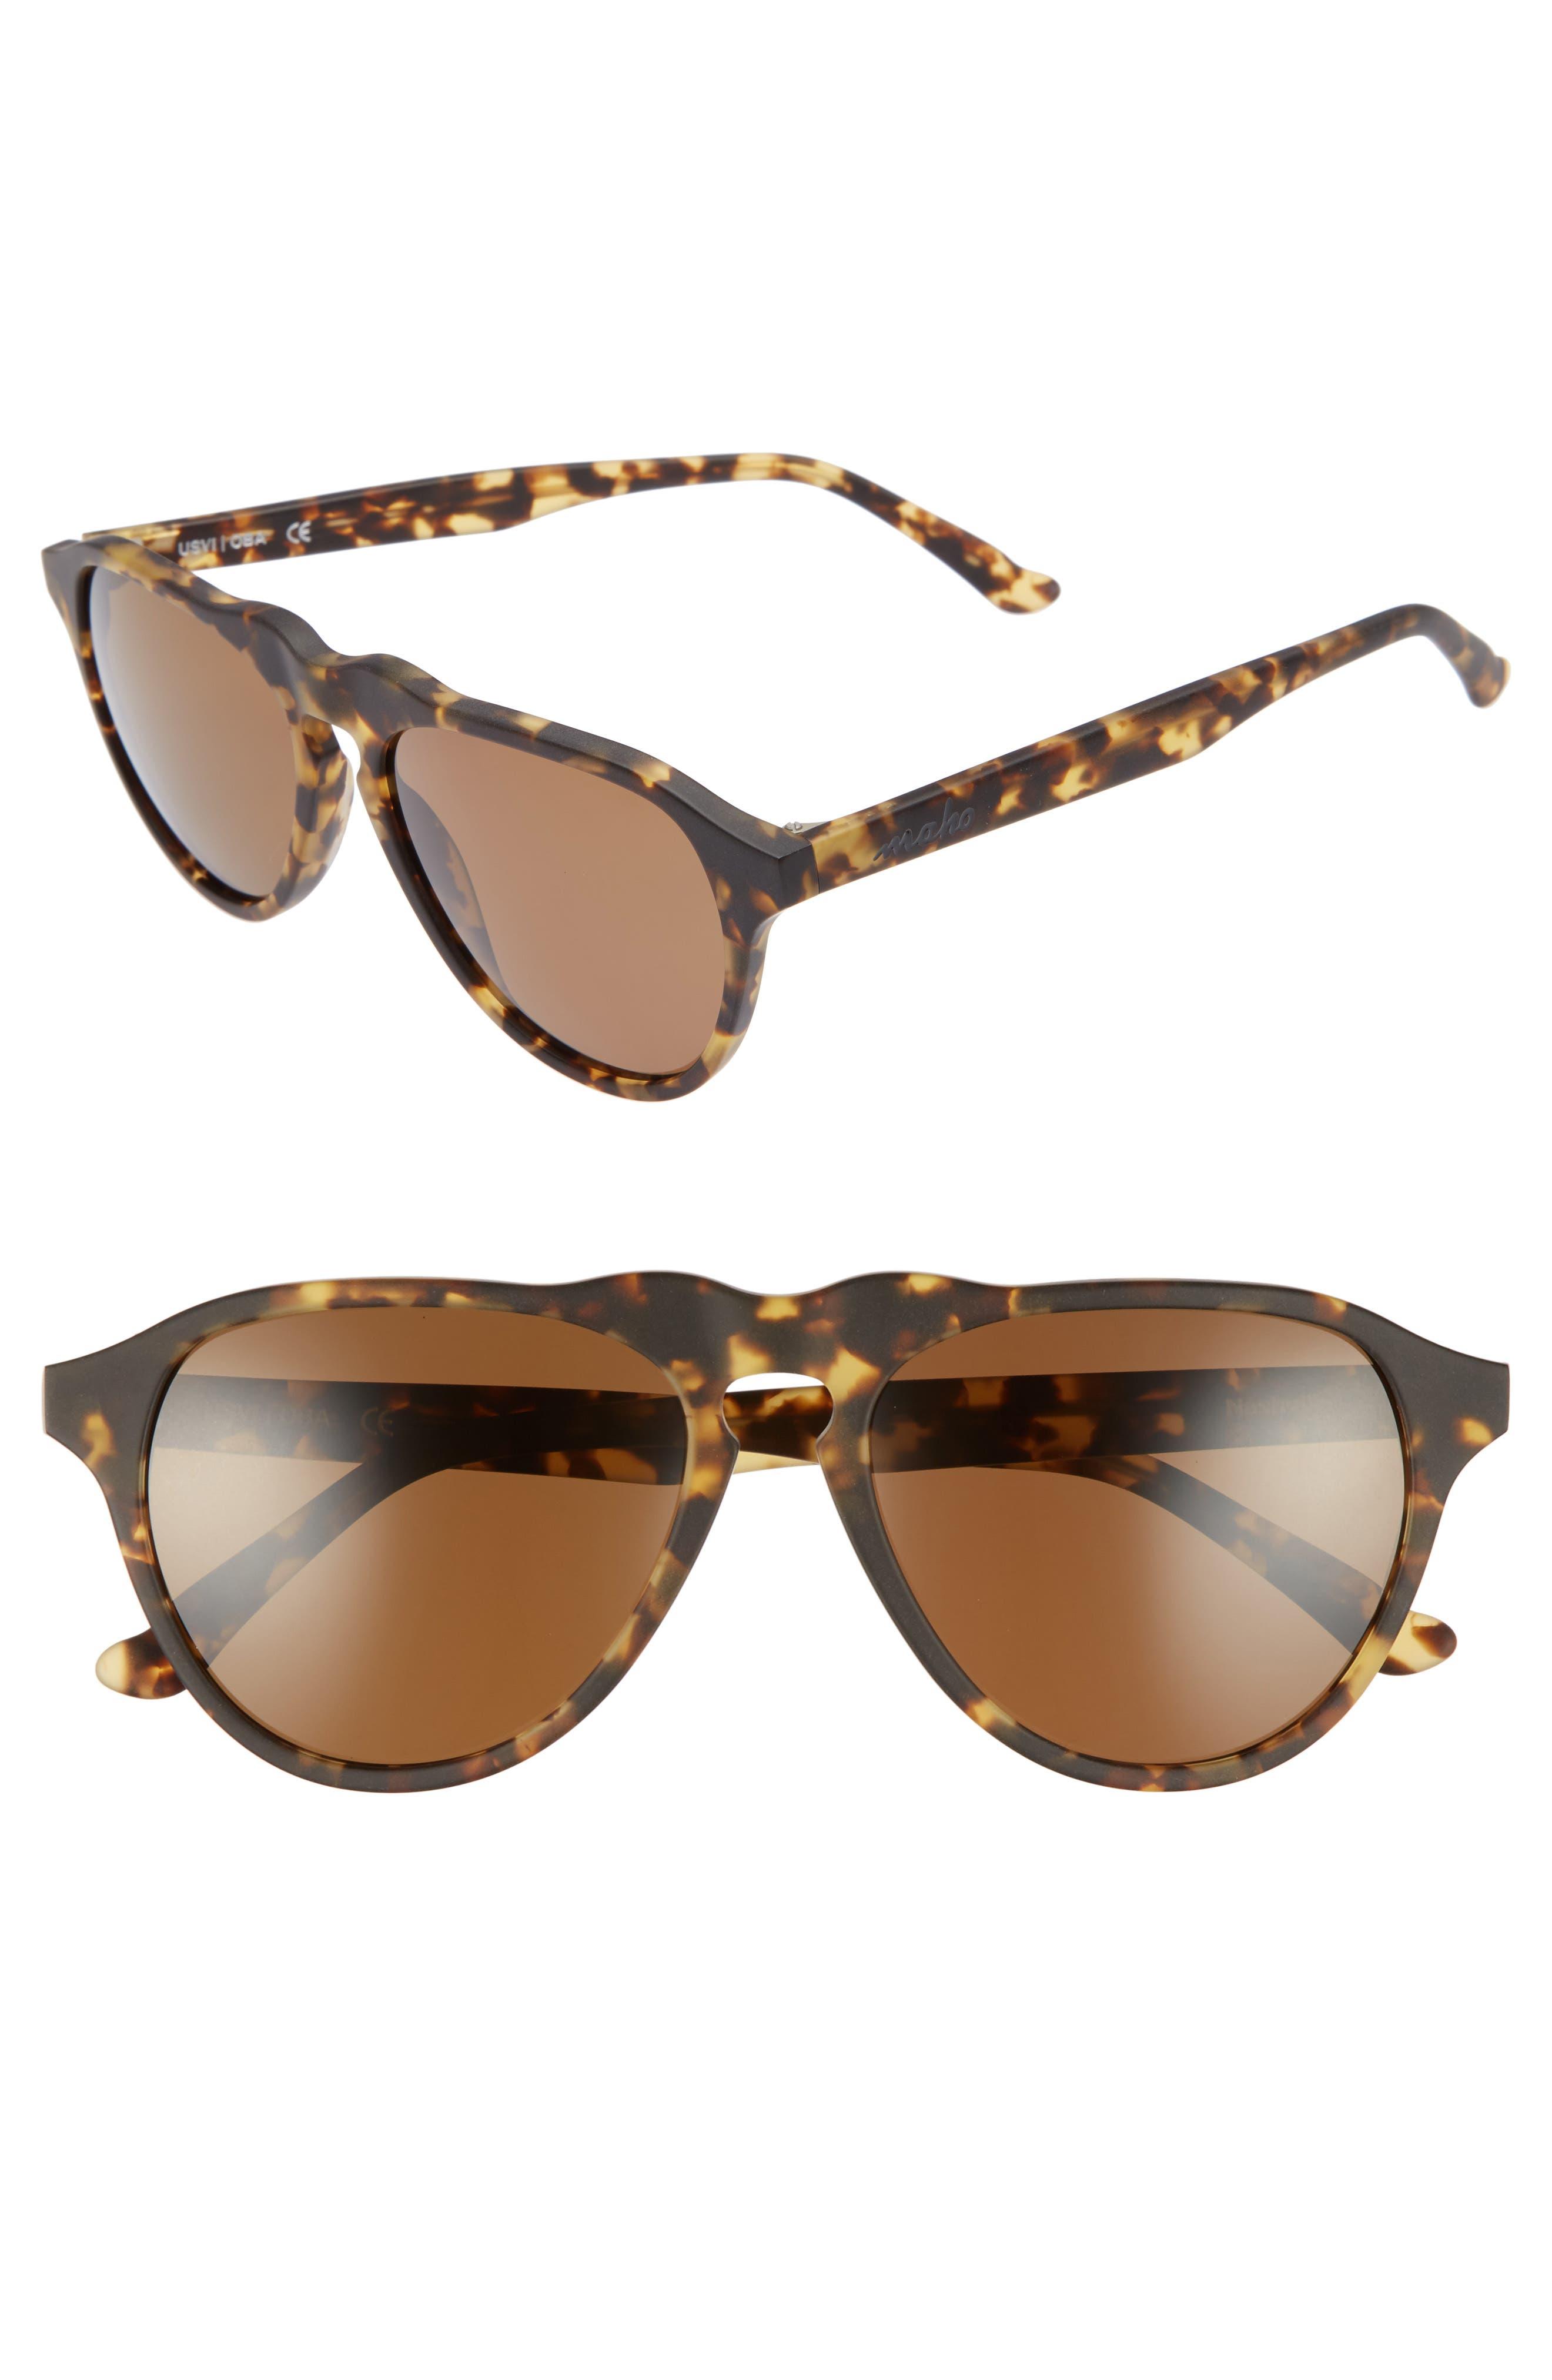 Nashville 54mm Polarized Aviator Sunglasses,                         Main,                         color, BENGAL